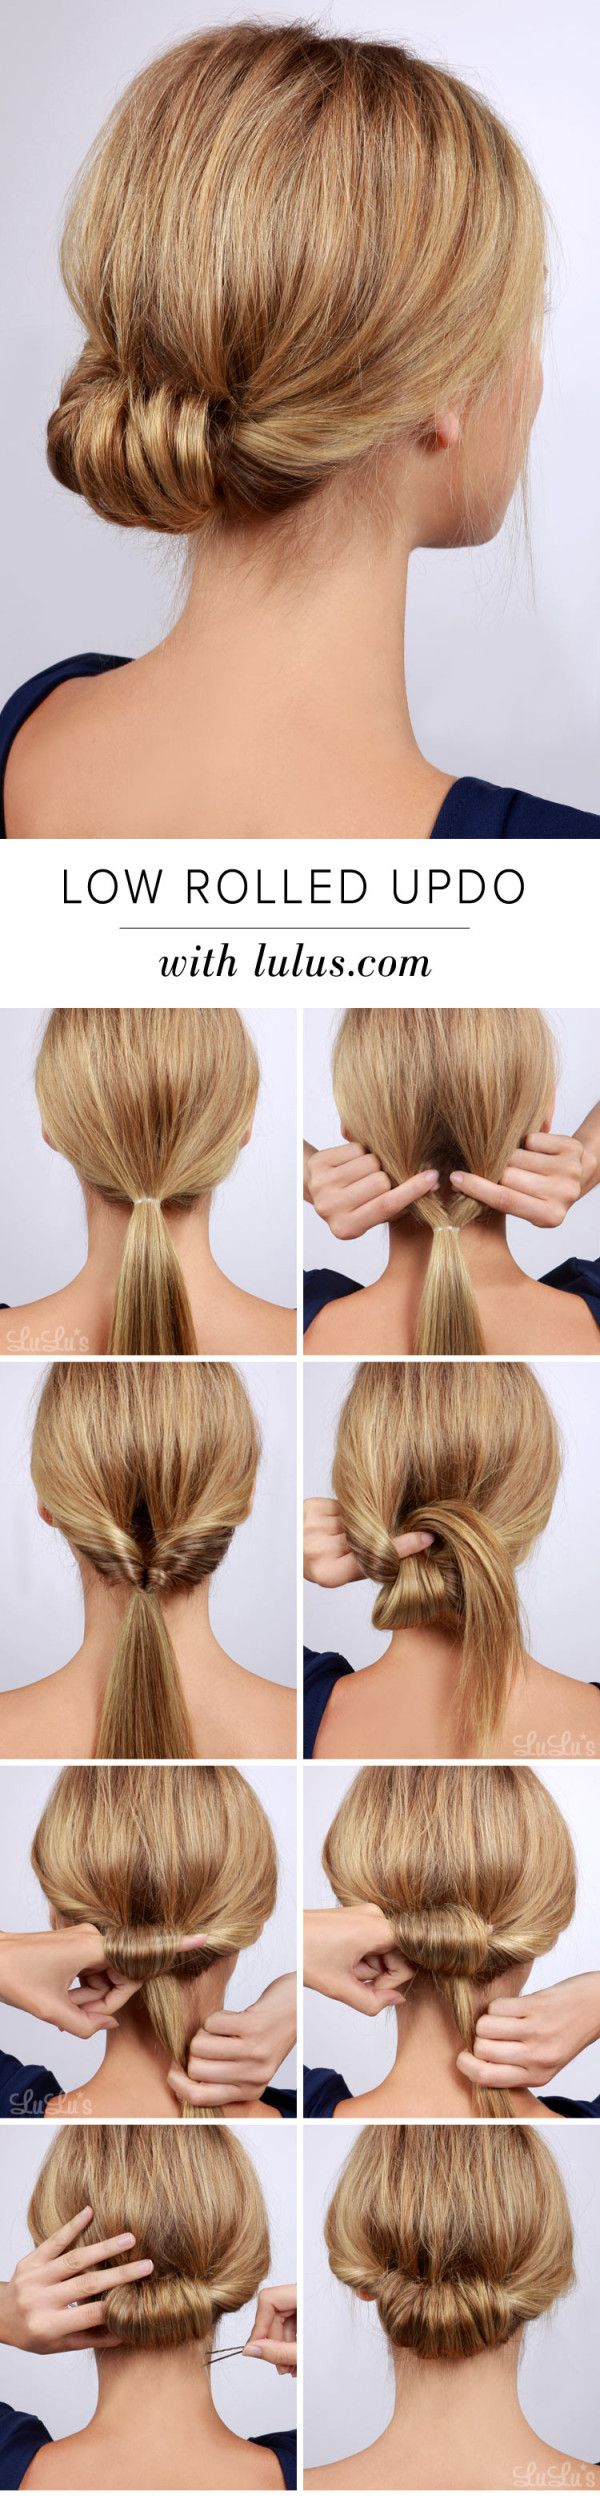 Astonishing 1000 Ideas About Fast Easy Hairstyles On Pinterest Running Late Short Hairstyles Gunalazisus